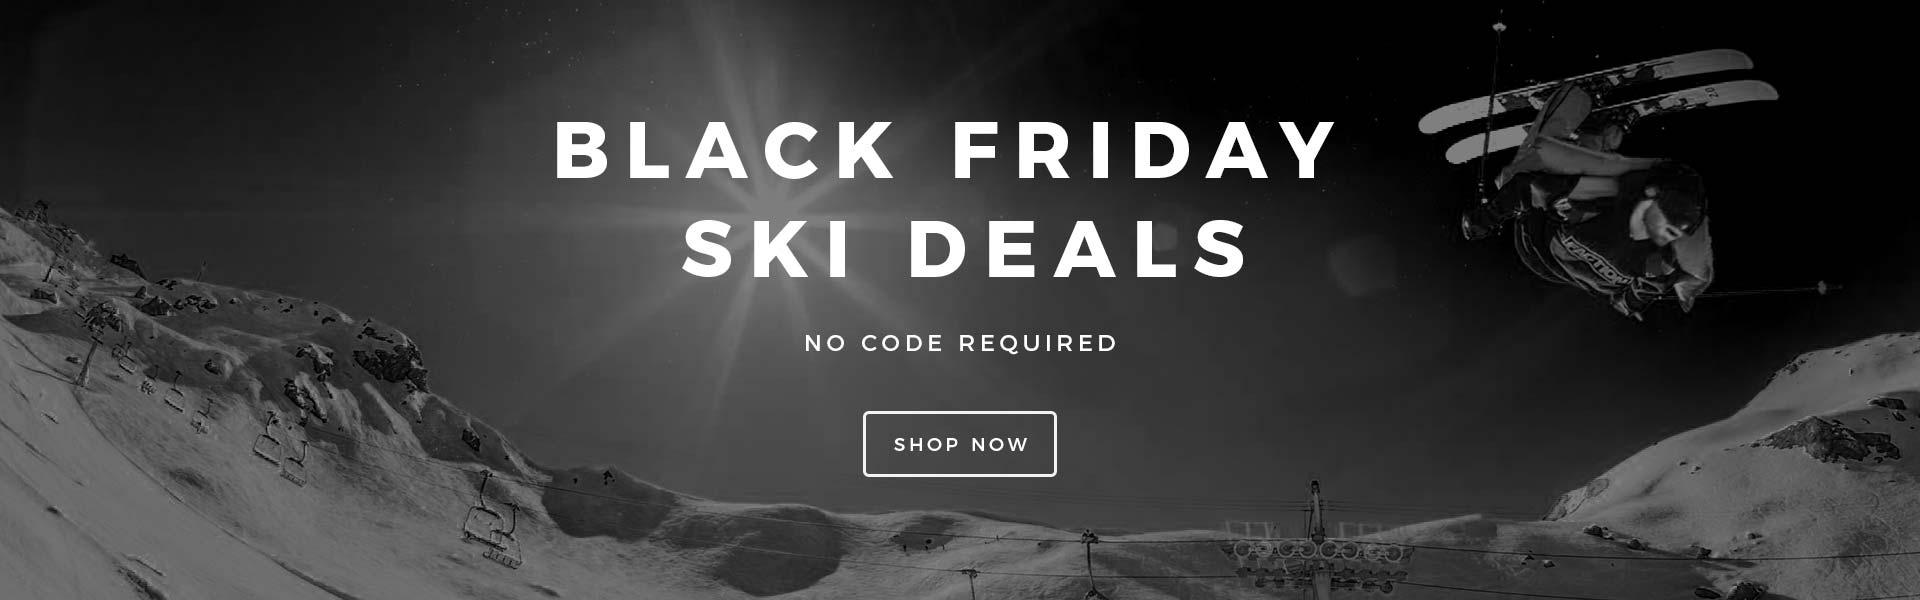 Black Friday Skis Deals